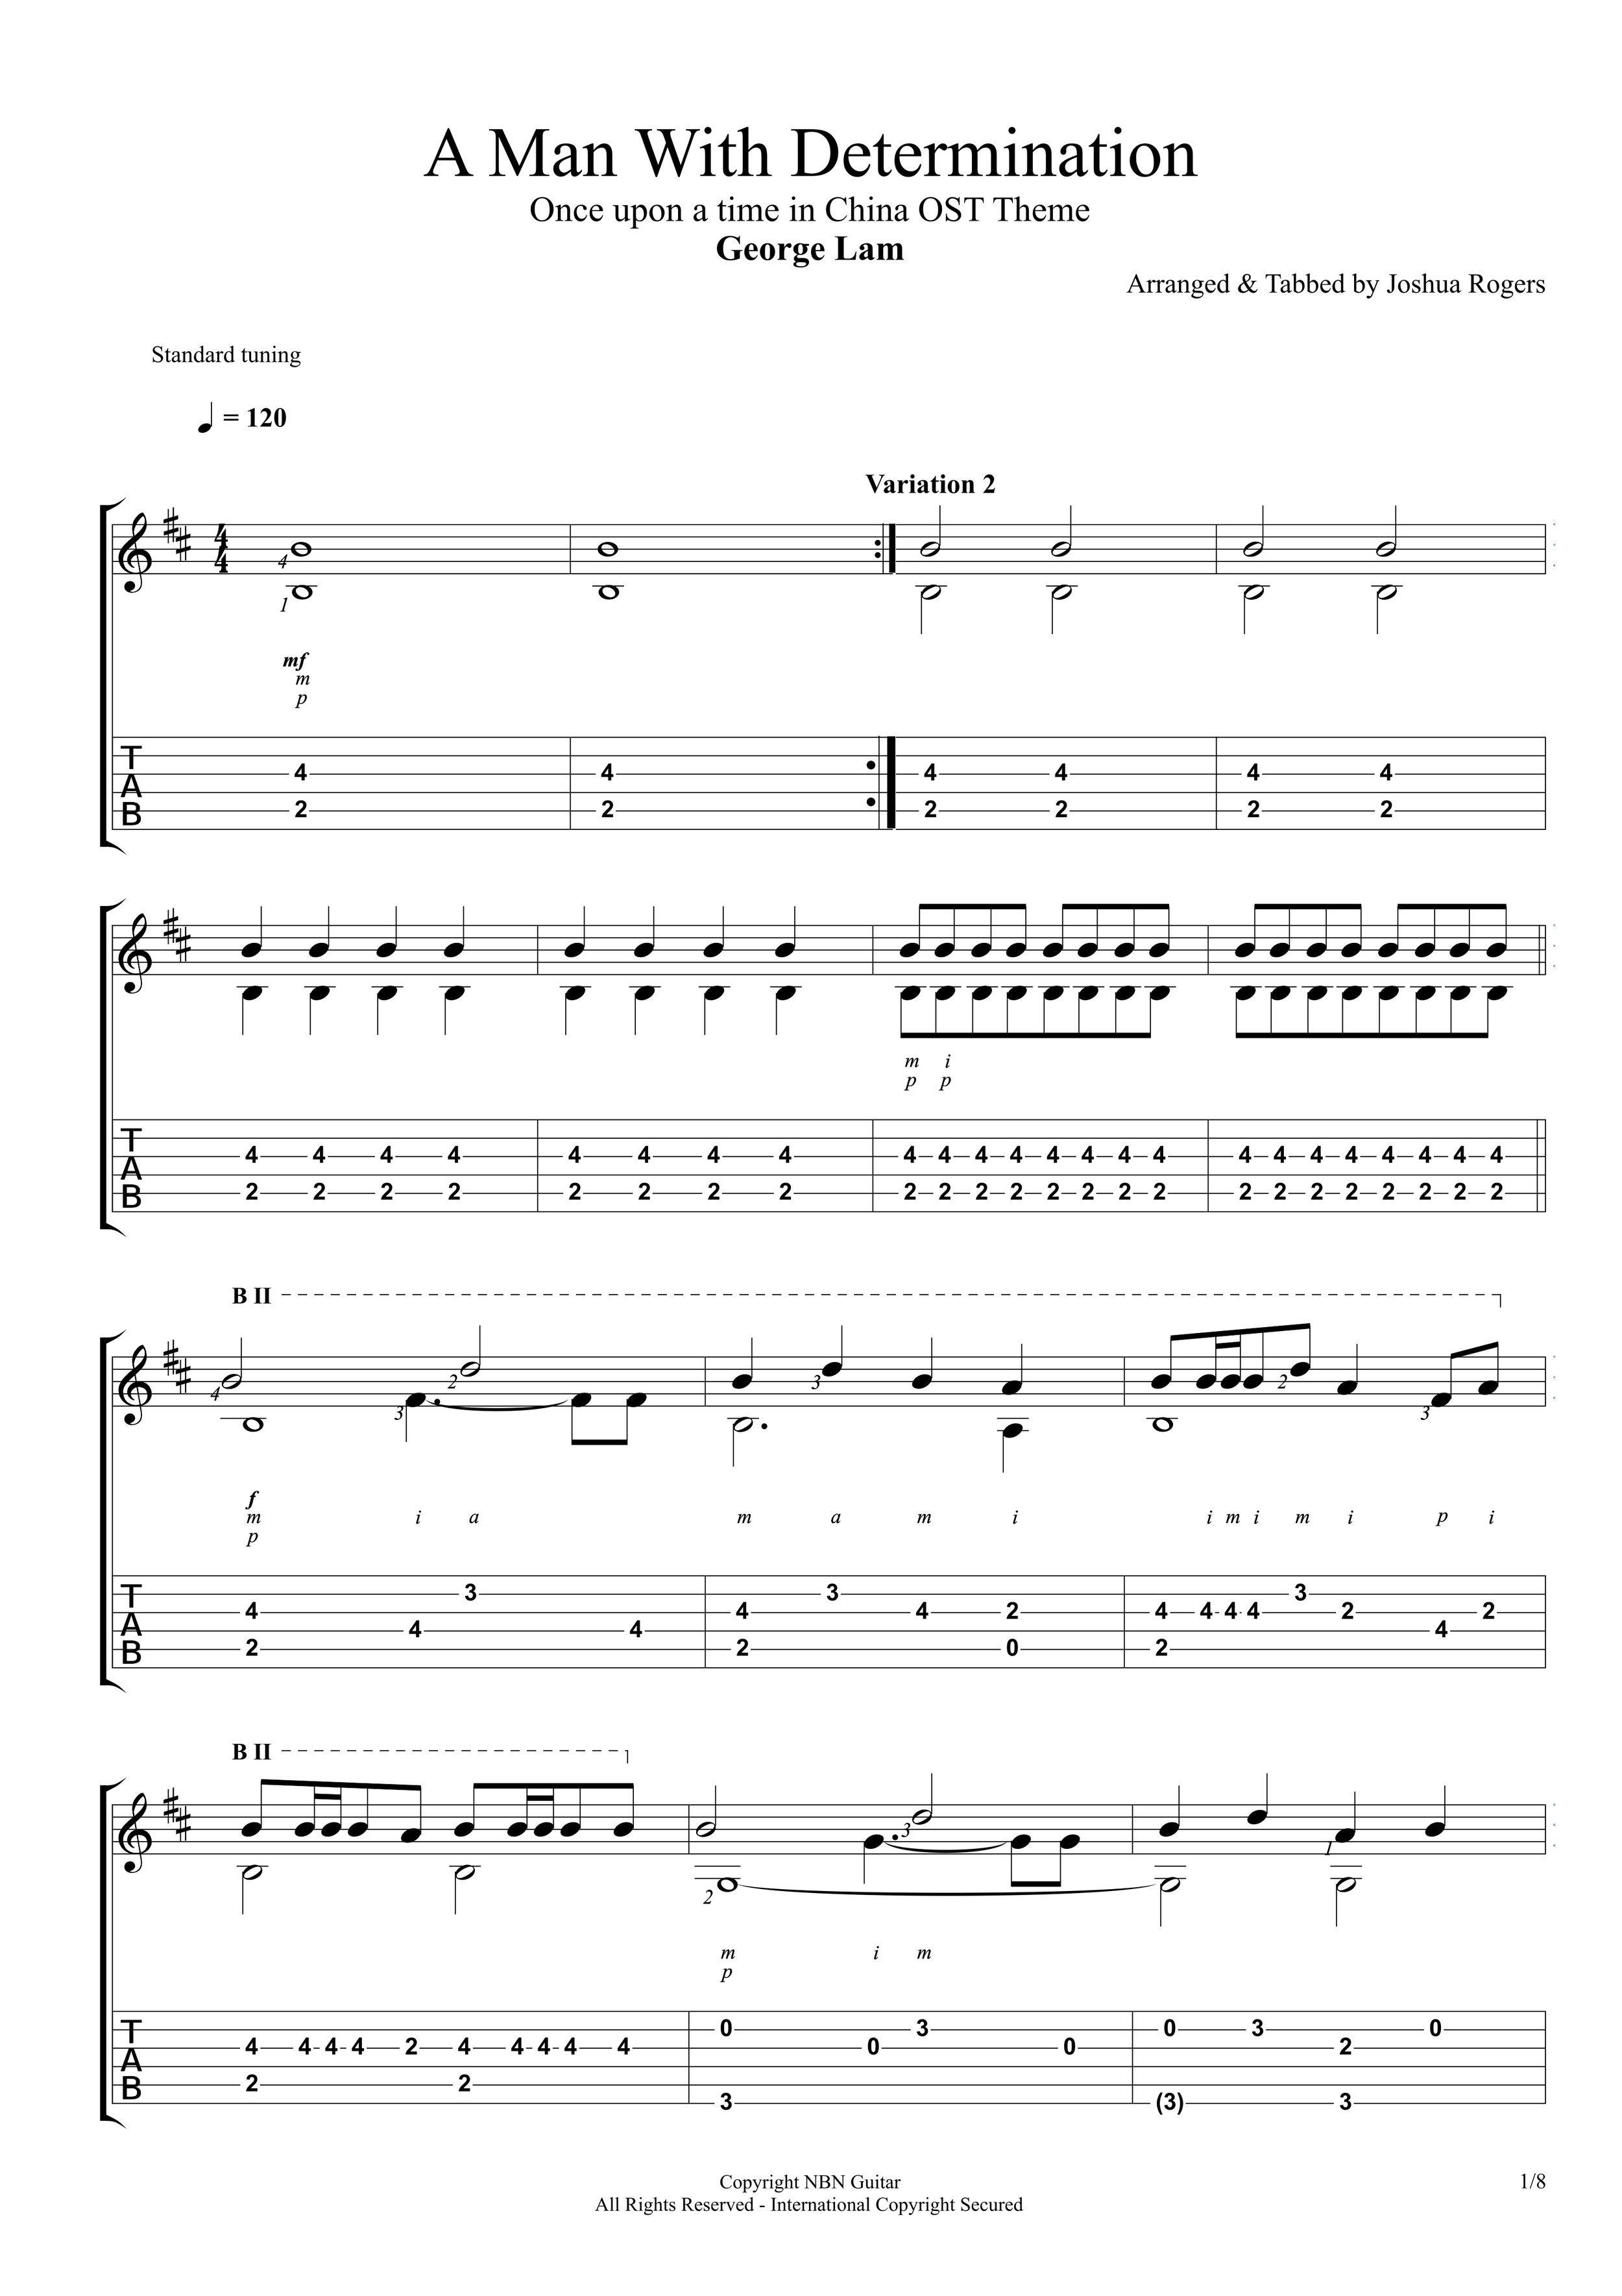 A man with determination (Sheet Music & Tabs)-p03.jpg